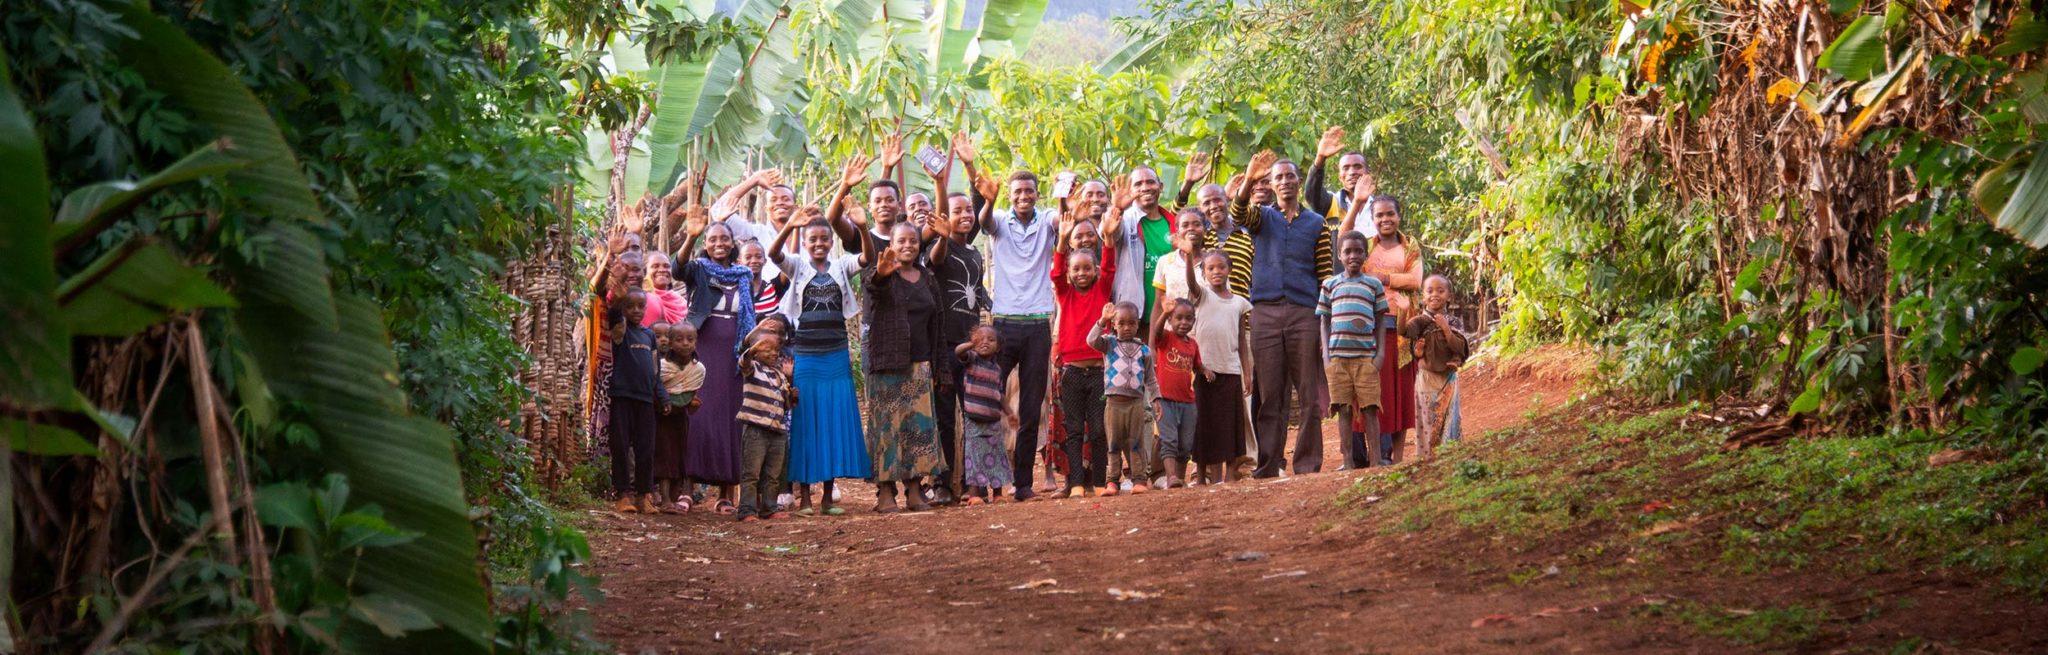 alemayehu family waving goodby